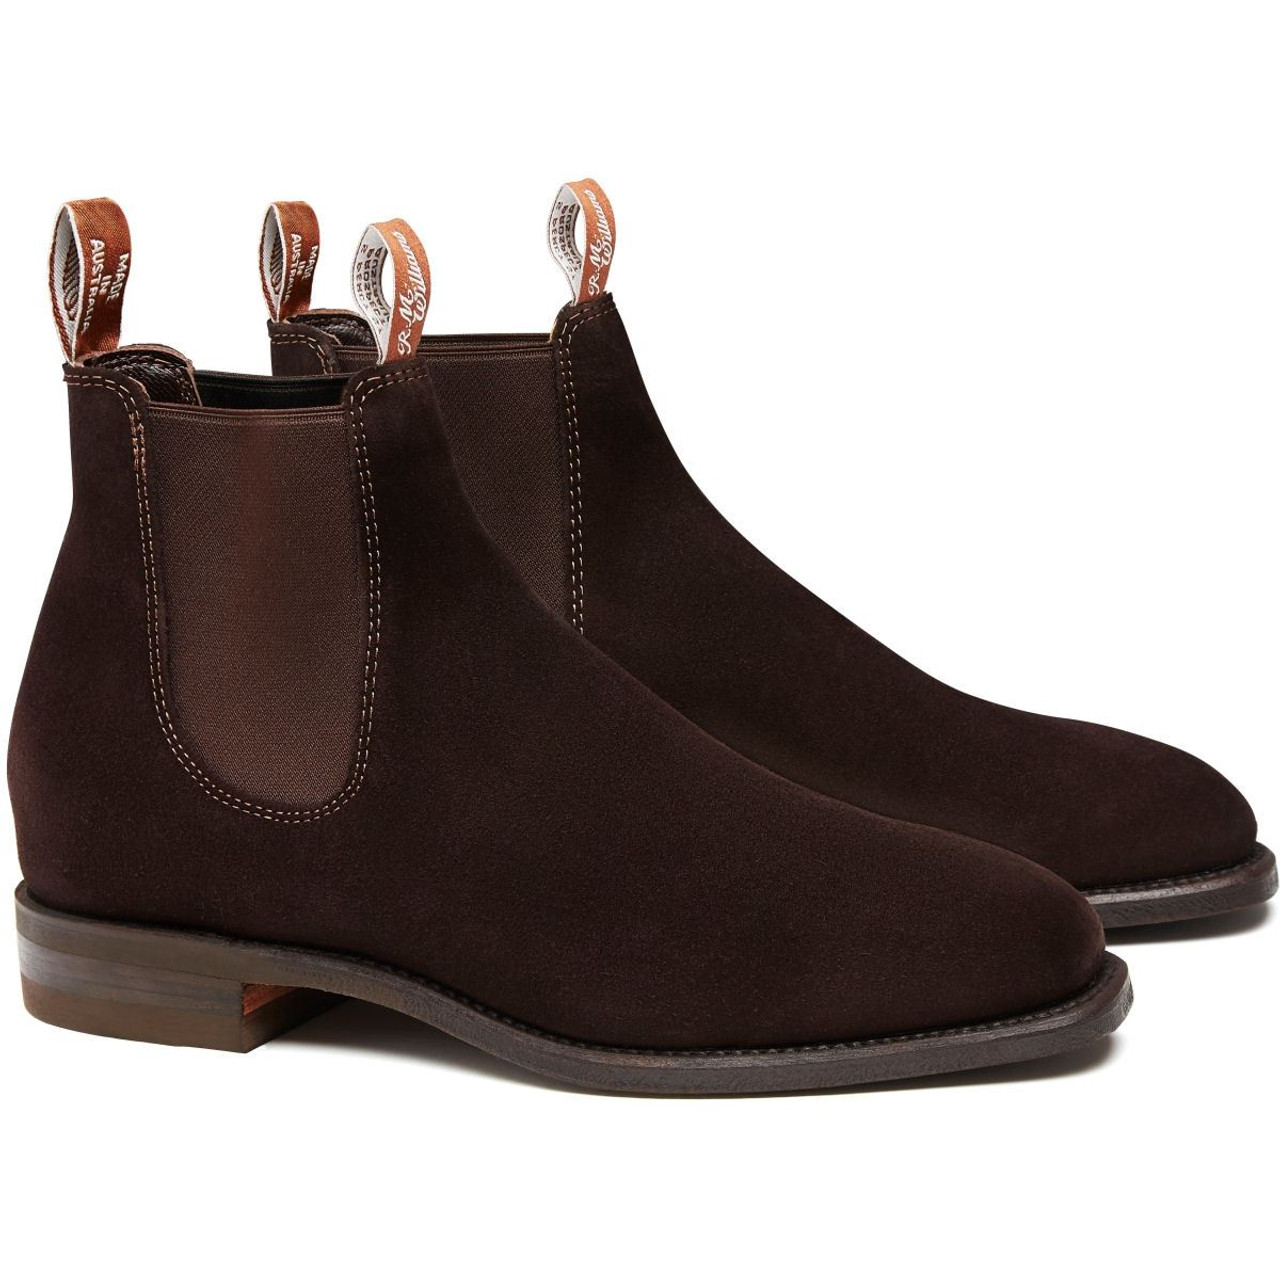 R.M. Williams Suede Comfort Craftsman Boots